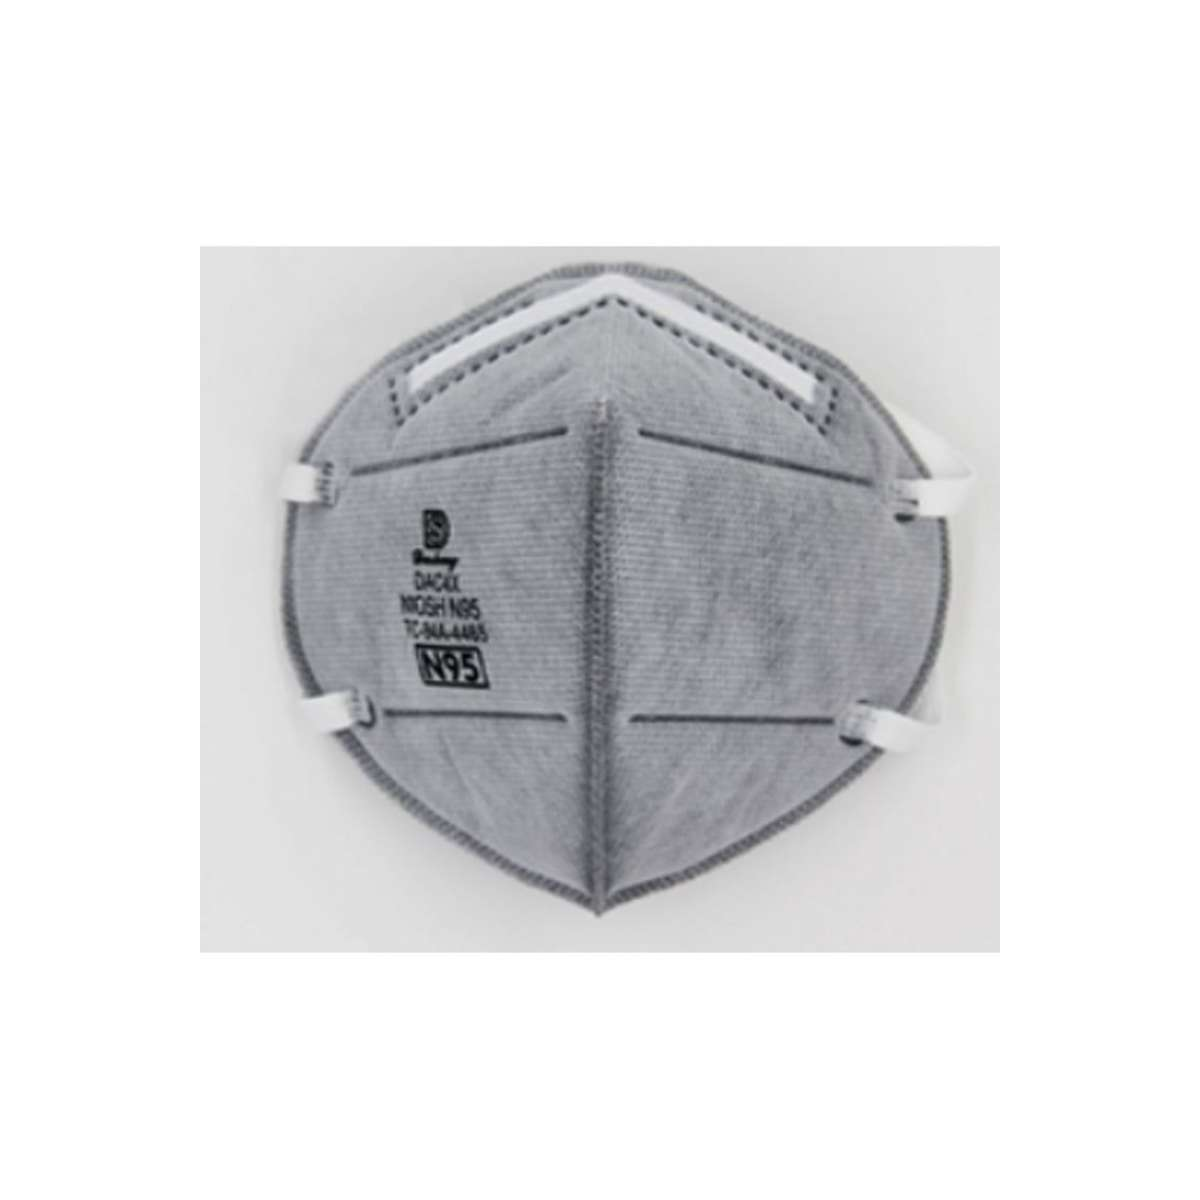 N95 NIOSH Respirator Mask - Case of 480